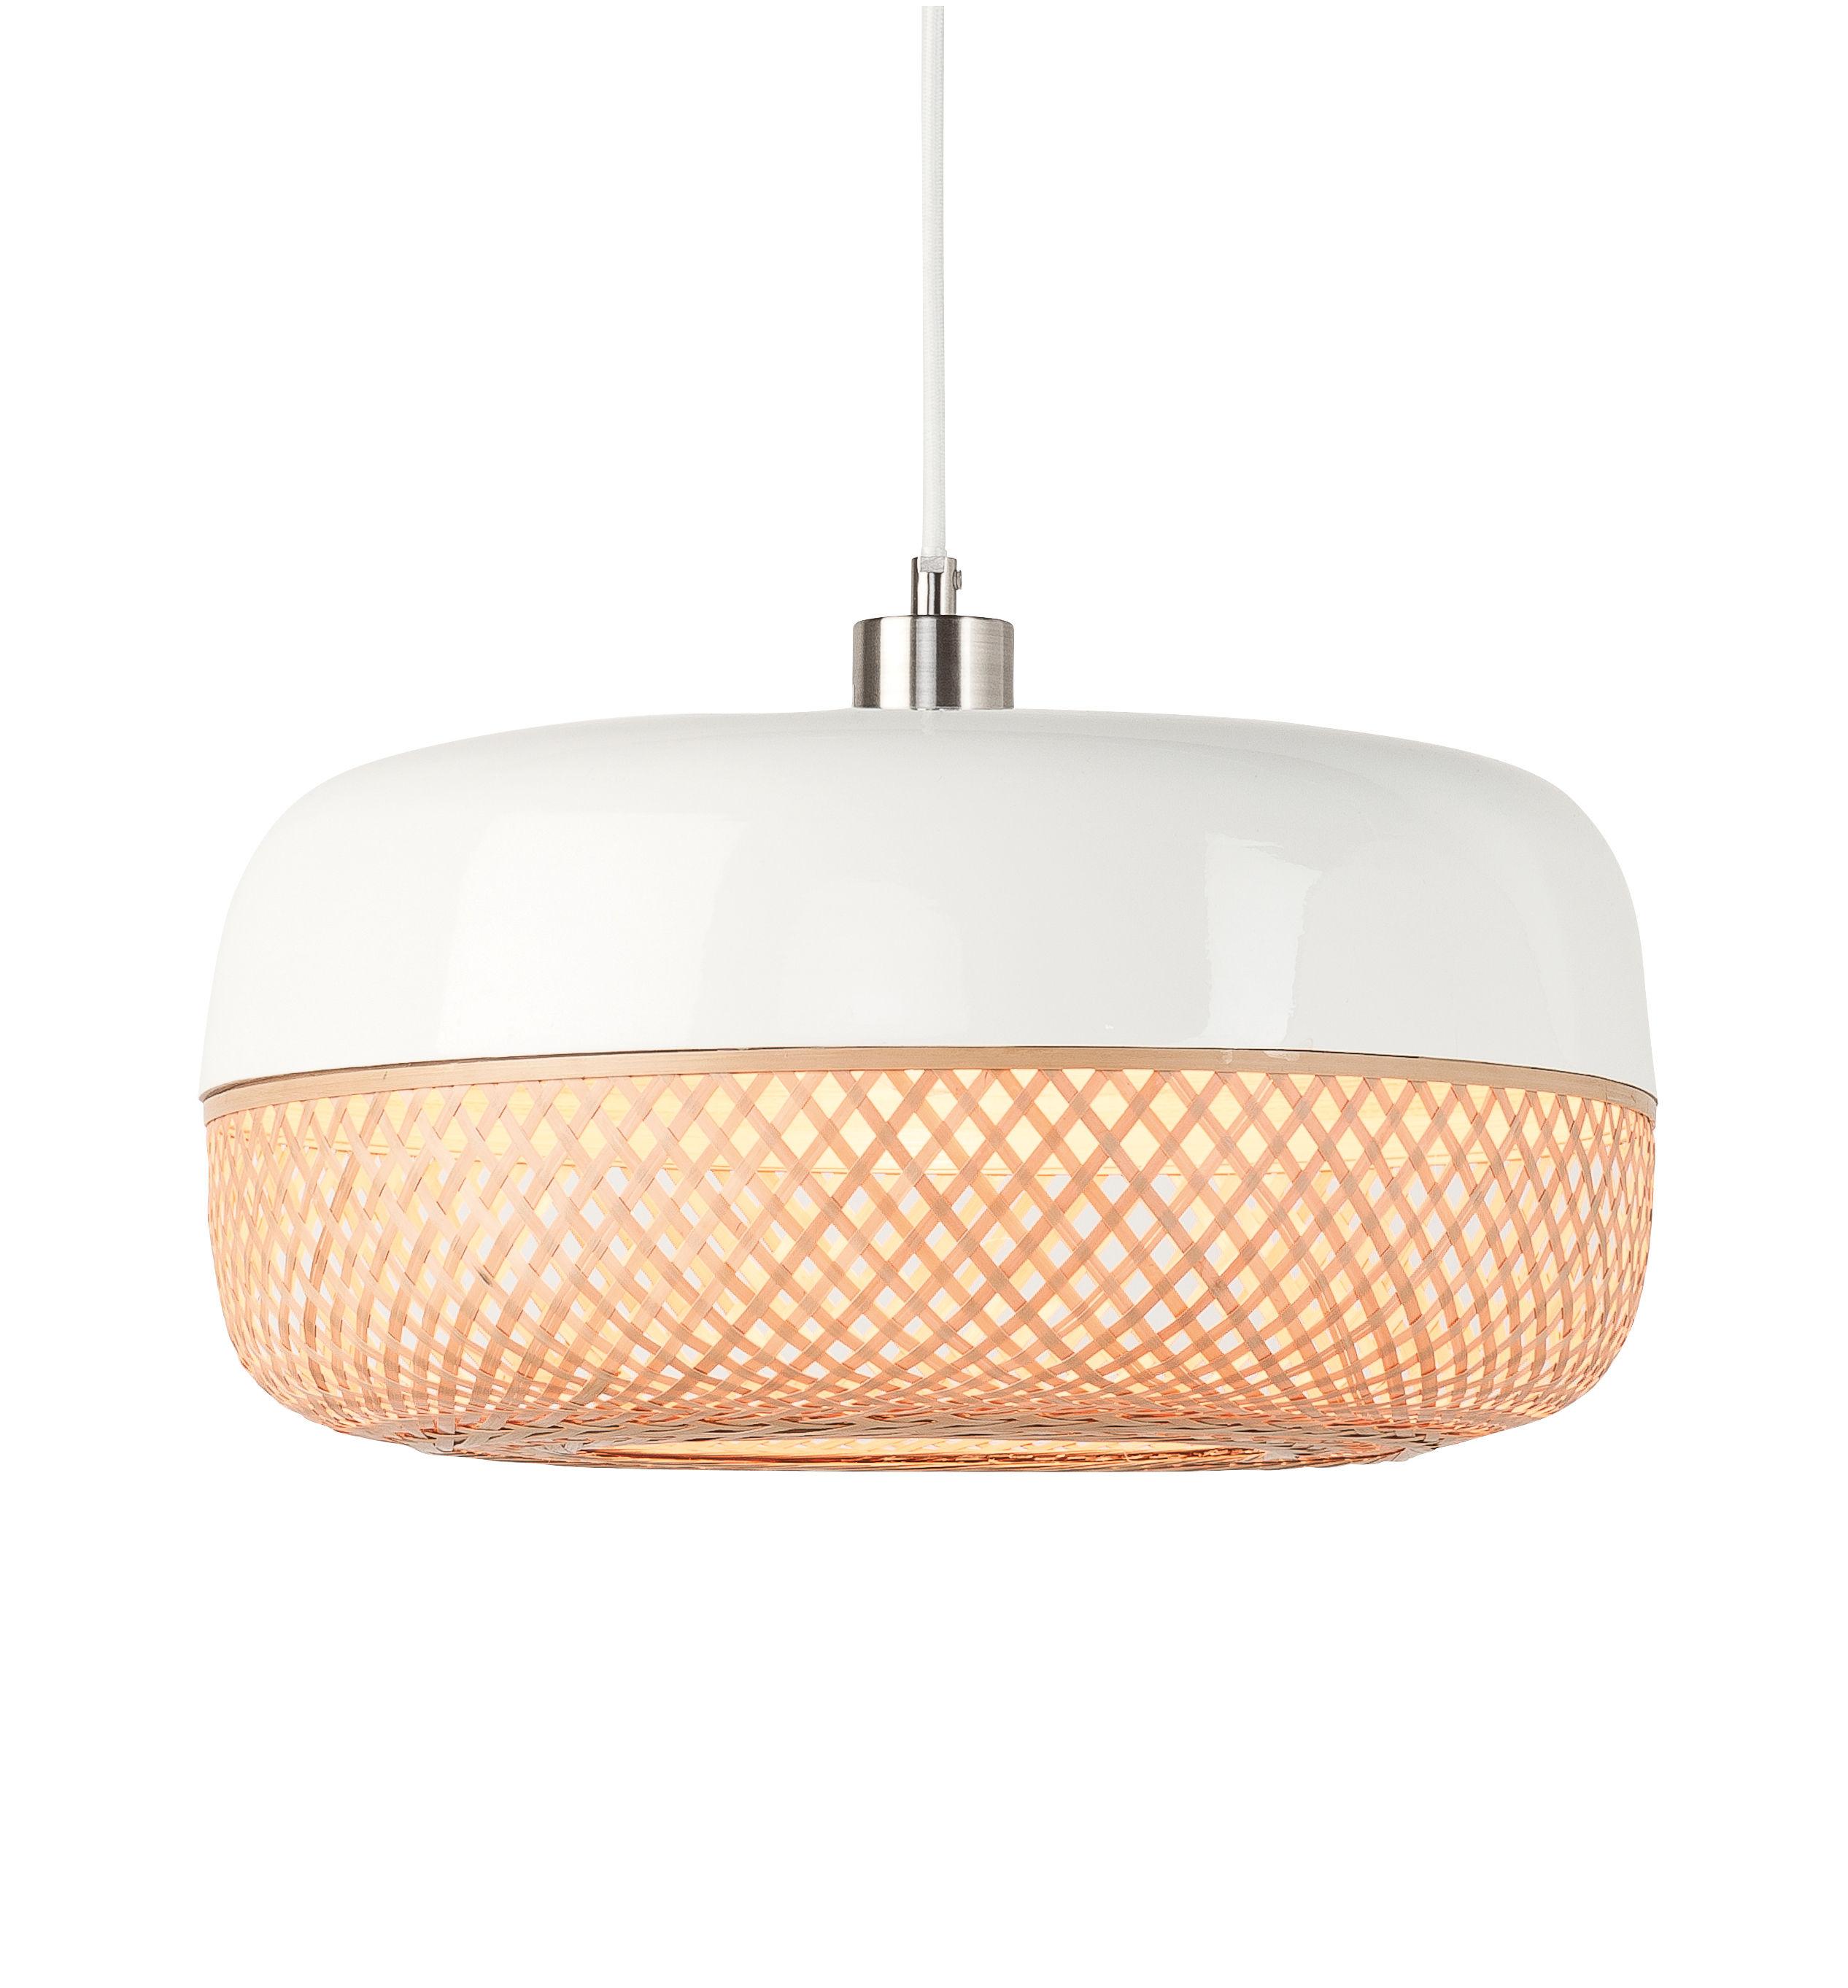 Illuminazione - Lampadari - Sospensione Mekong - / Bambù - Ø 40 x H 22 cm di GOOD&MOJO - Ø 40xH 22 cm / Bambù & bianco - Bambou peint, Banbou naturel tressé